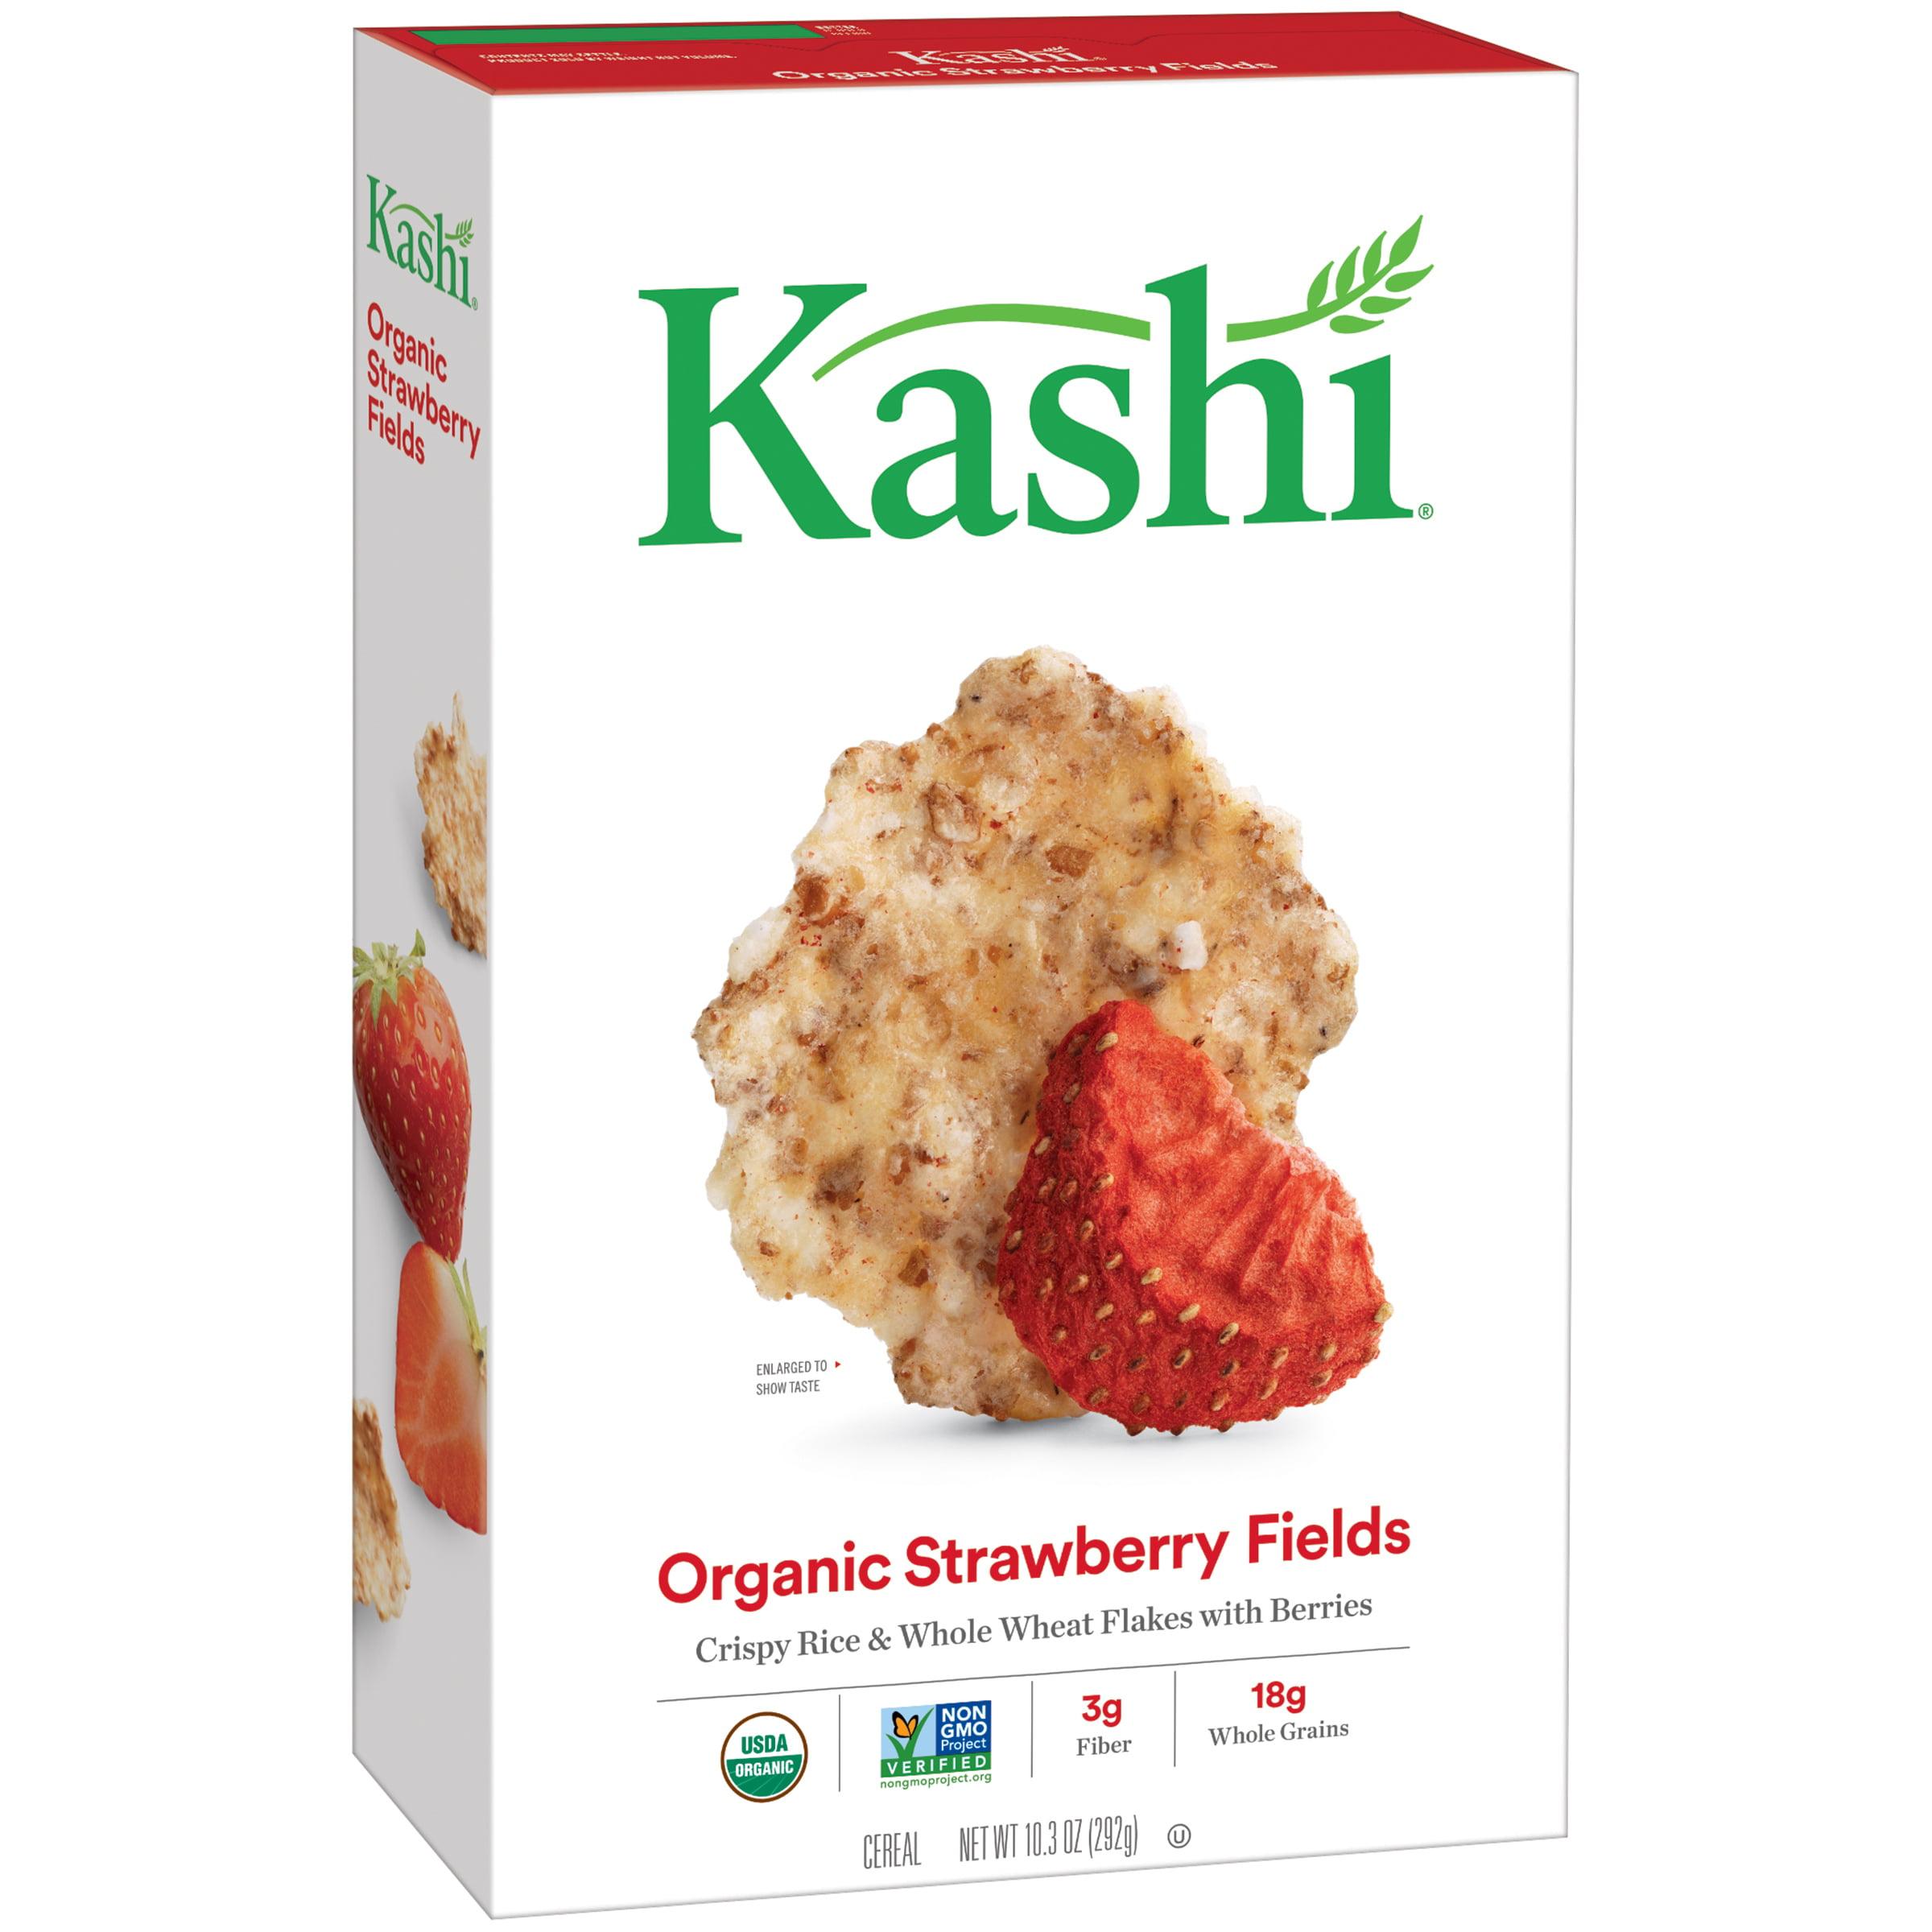 (2 Pack) Kashi Organic Breakfast Cereal, Strawberry Fields, 10.3 Oz